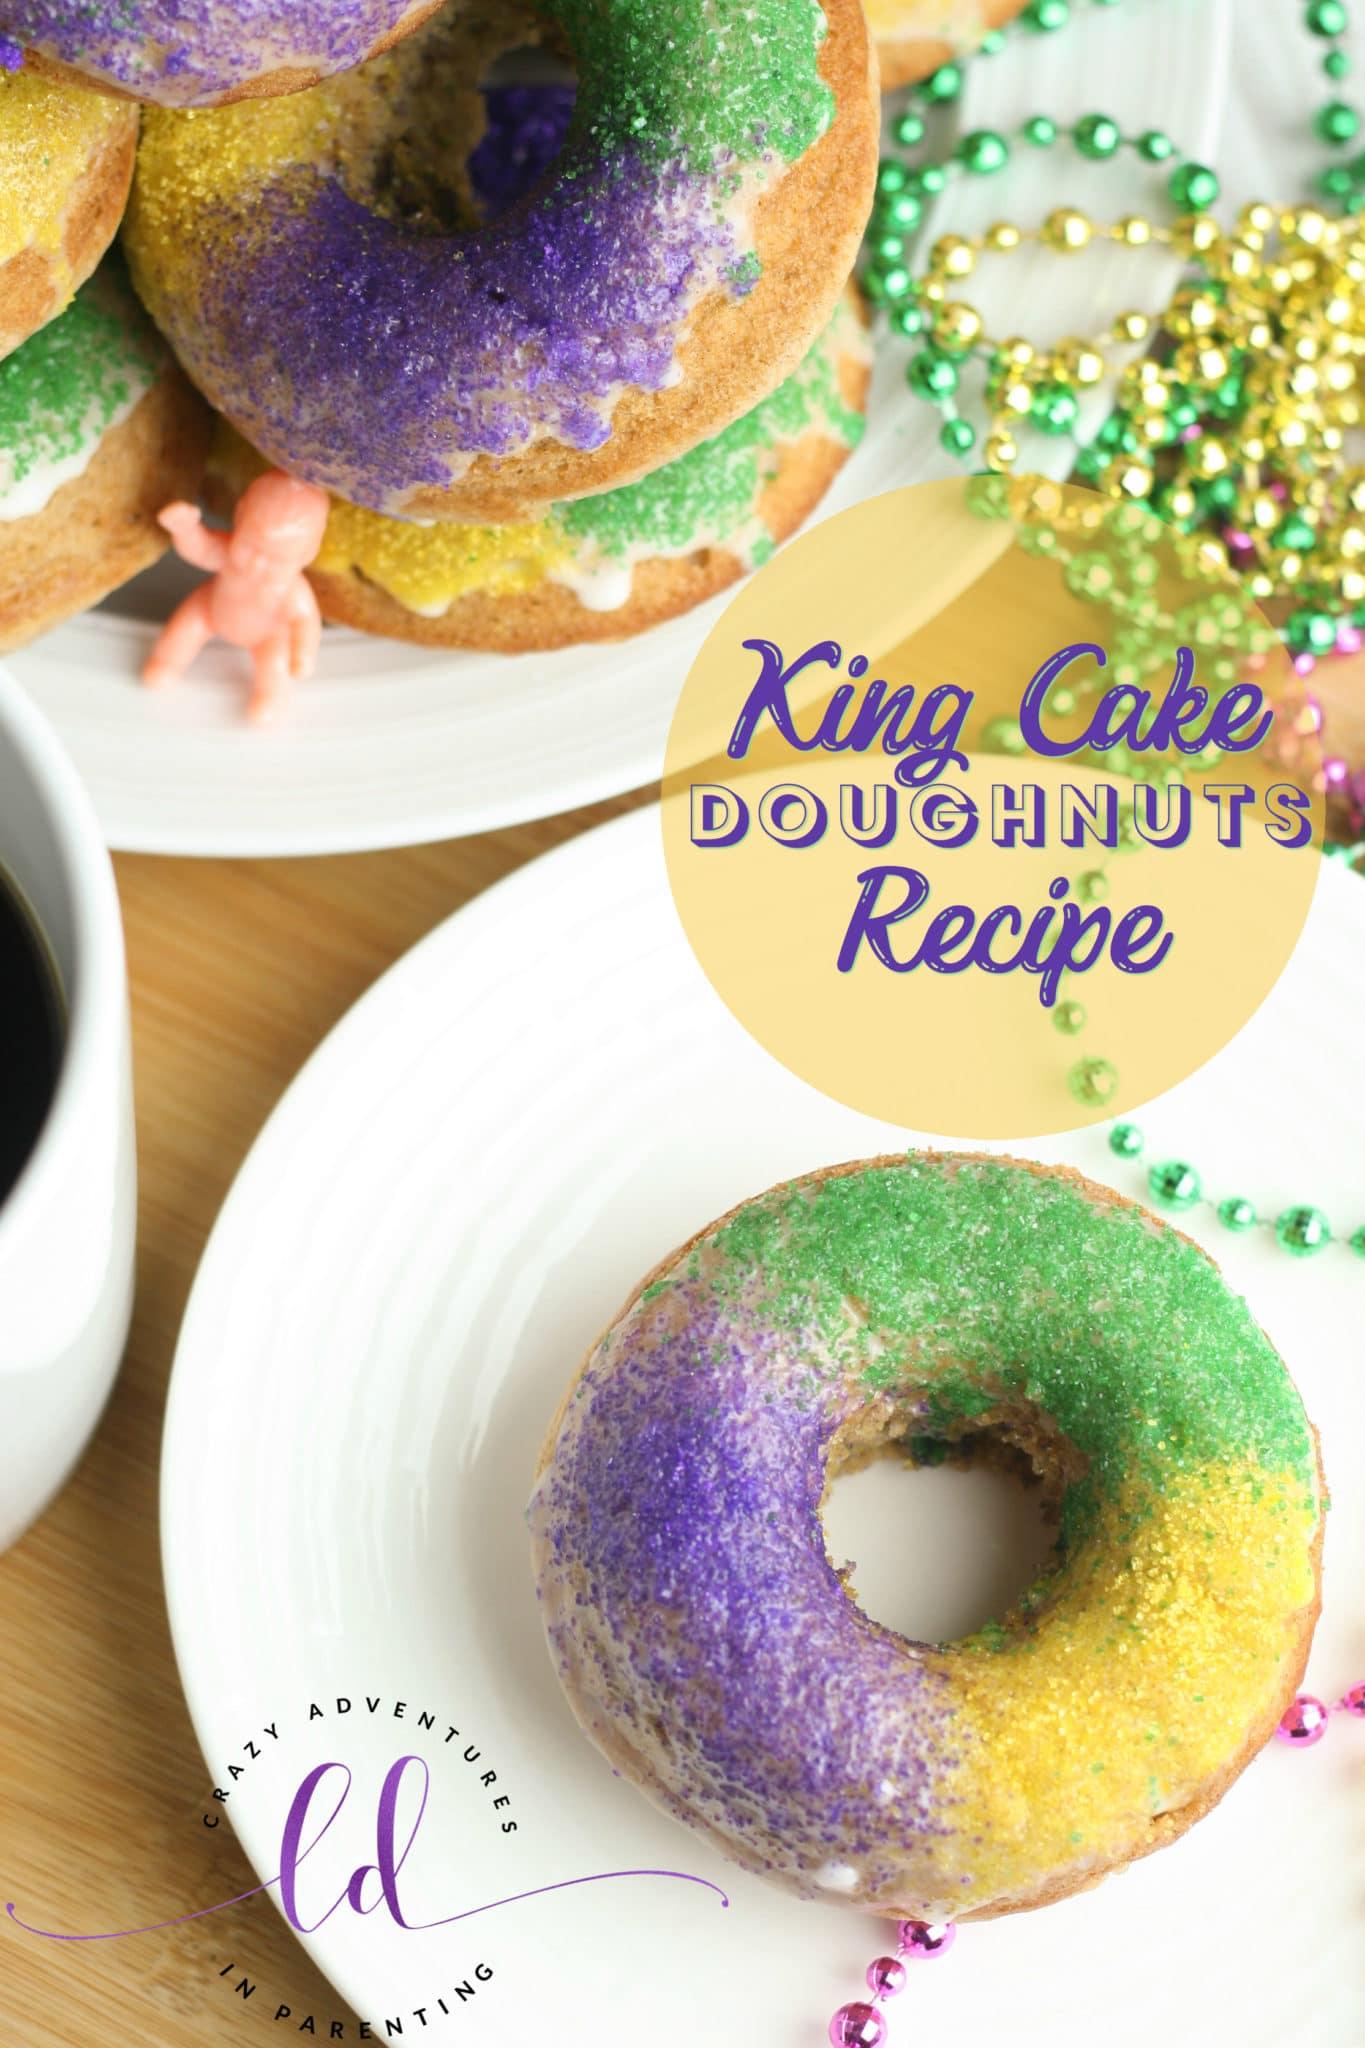 King Cake Doughnuts Recipe